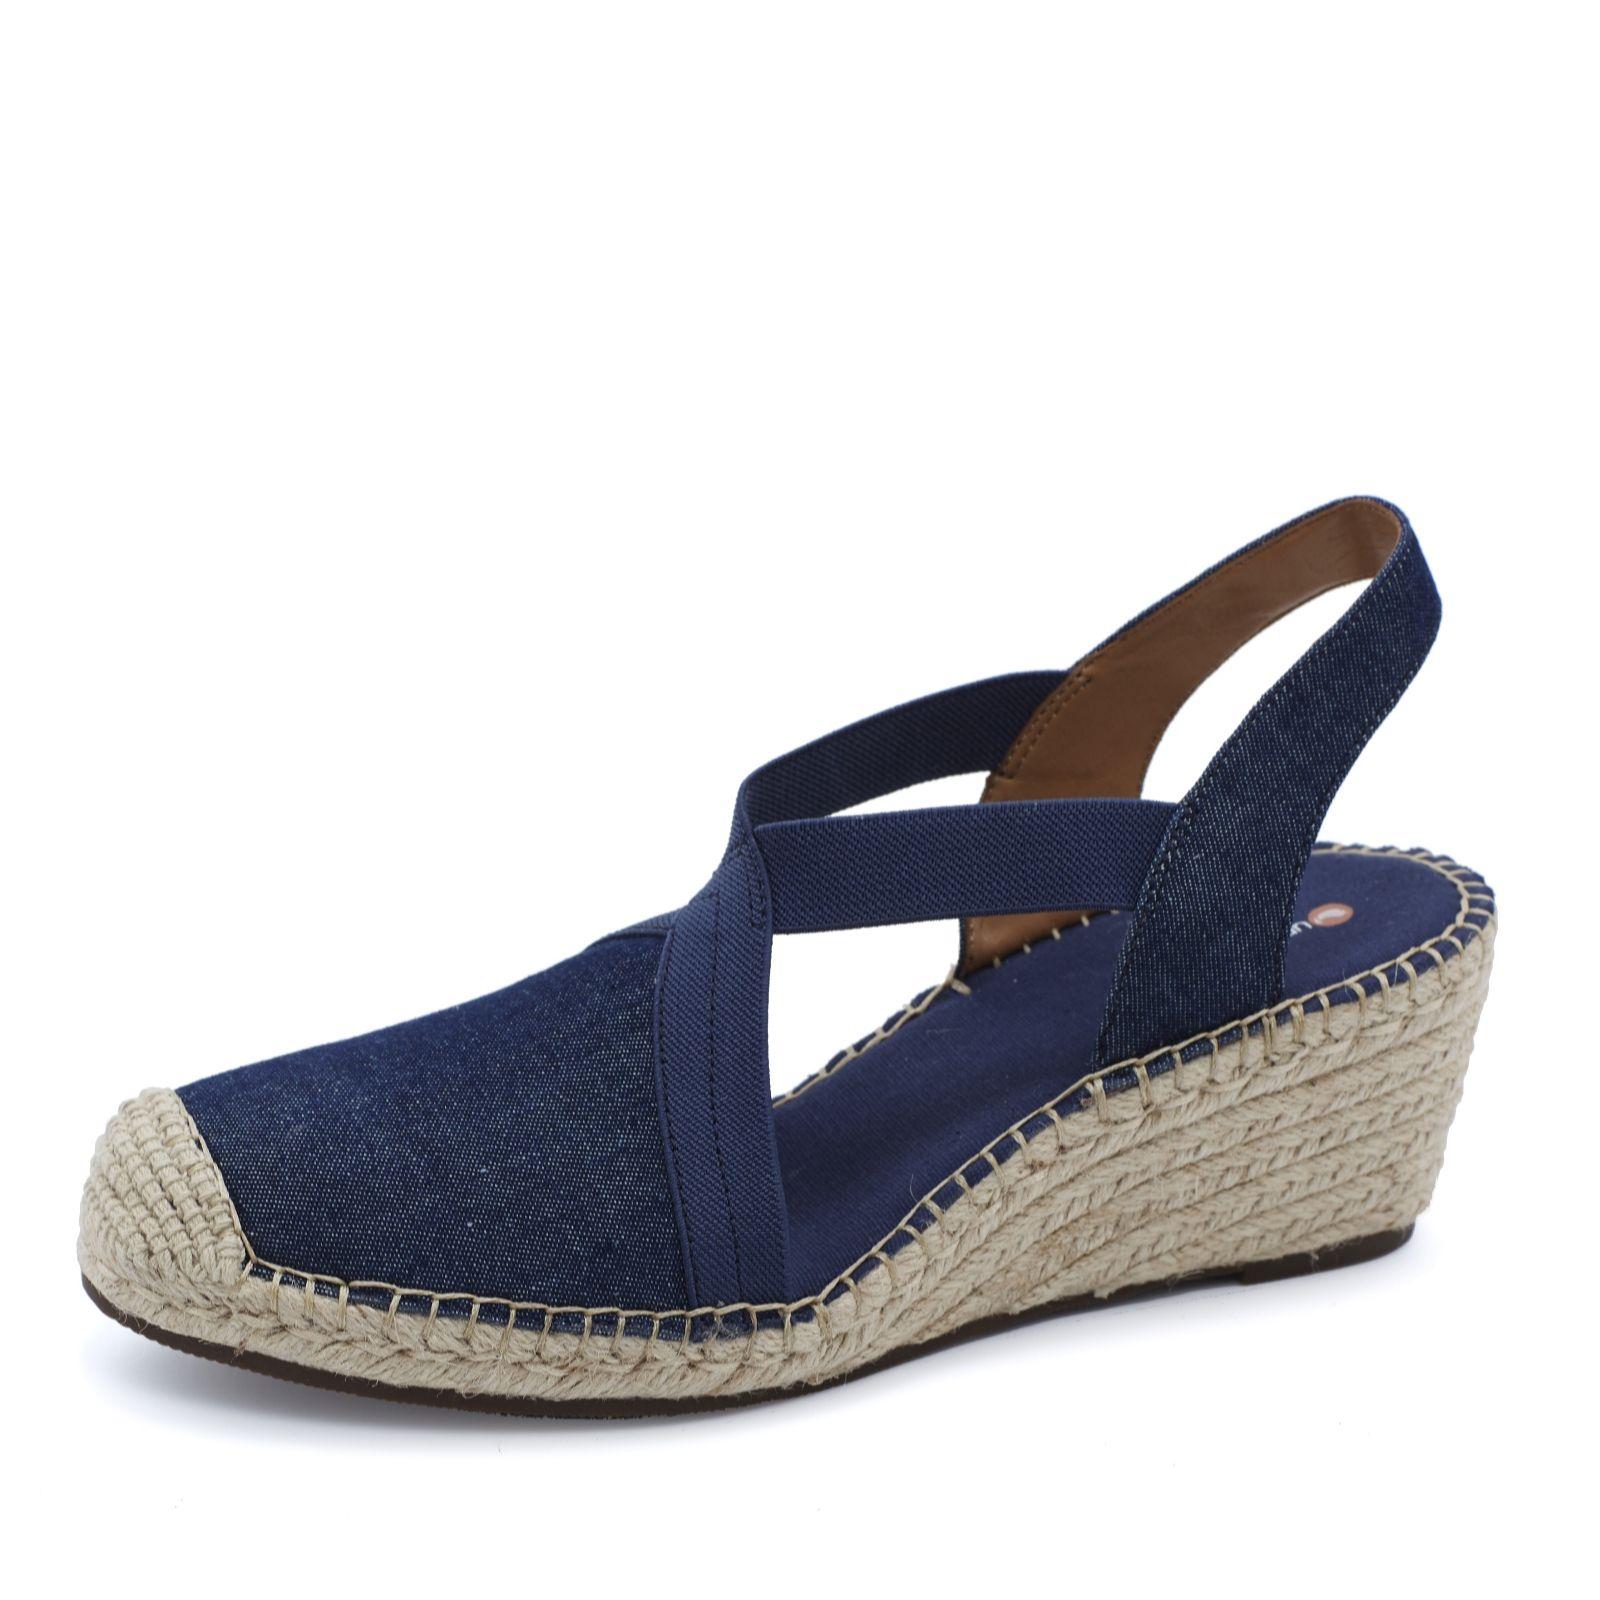 951113a3fc6 Clarks Petrina Lela Espadrille Wedge Sandal Standard Fit - QVC UK